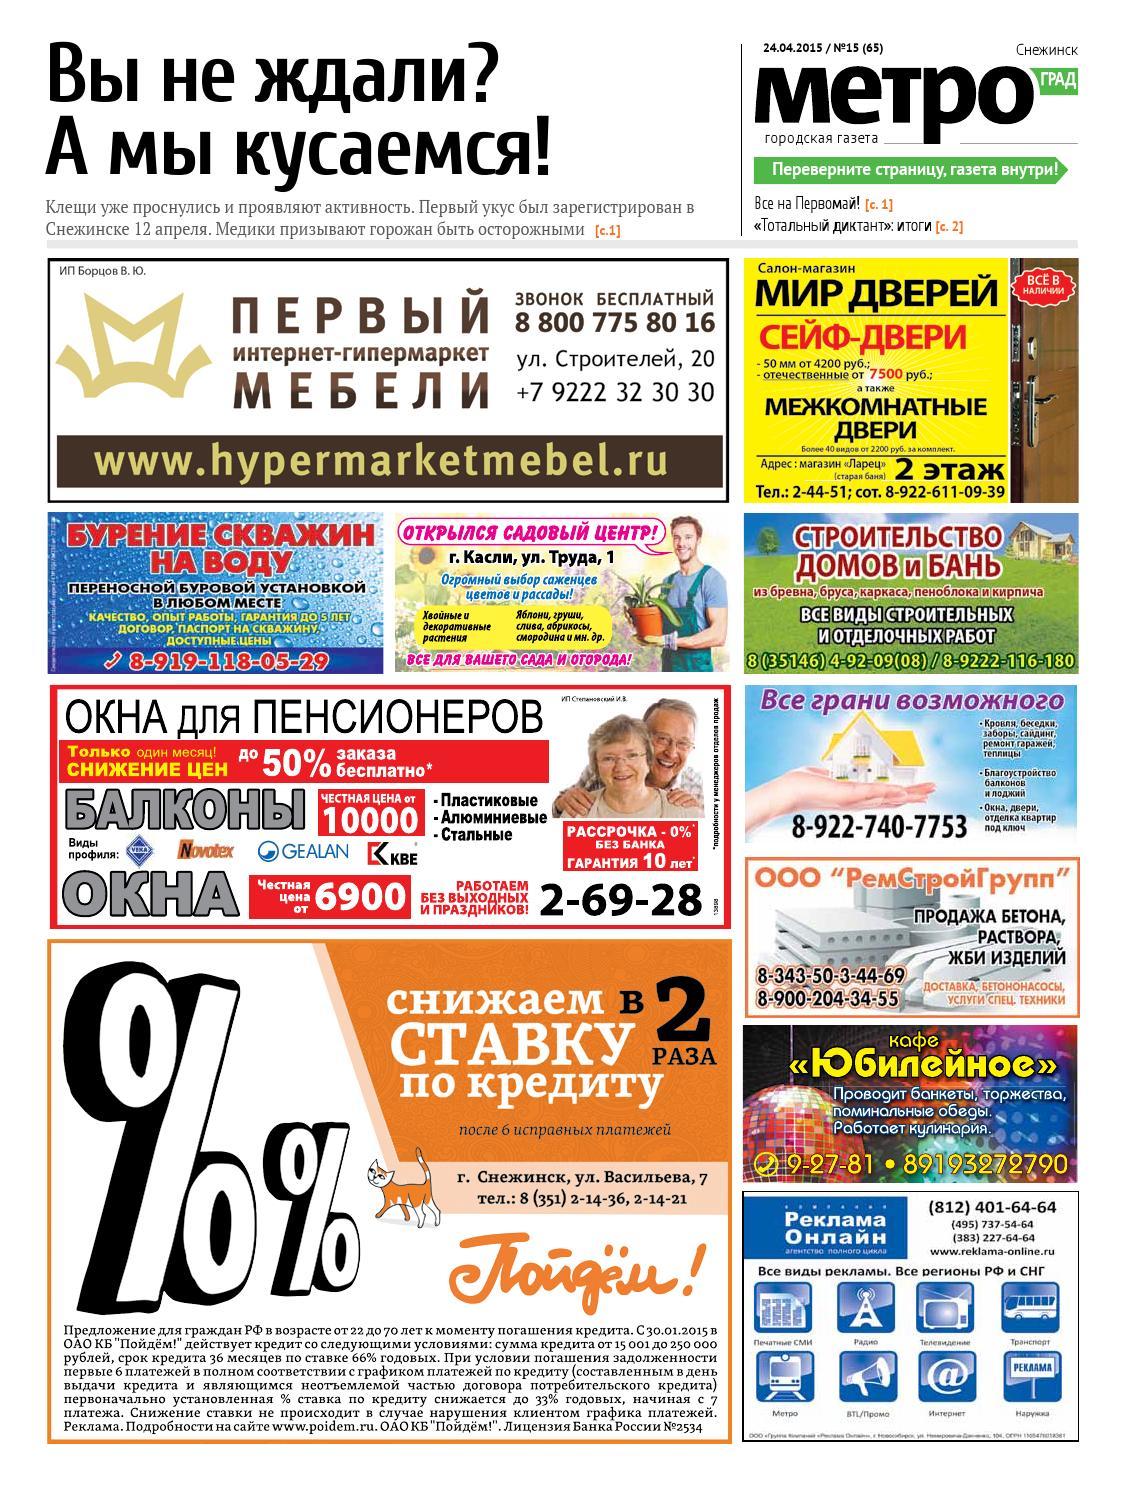 Метро 74 №15 (65) by Газета Метро Снежинск - issuu 89c91d6f147